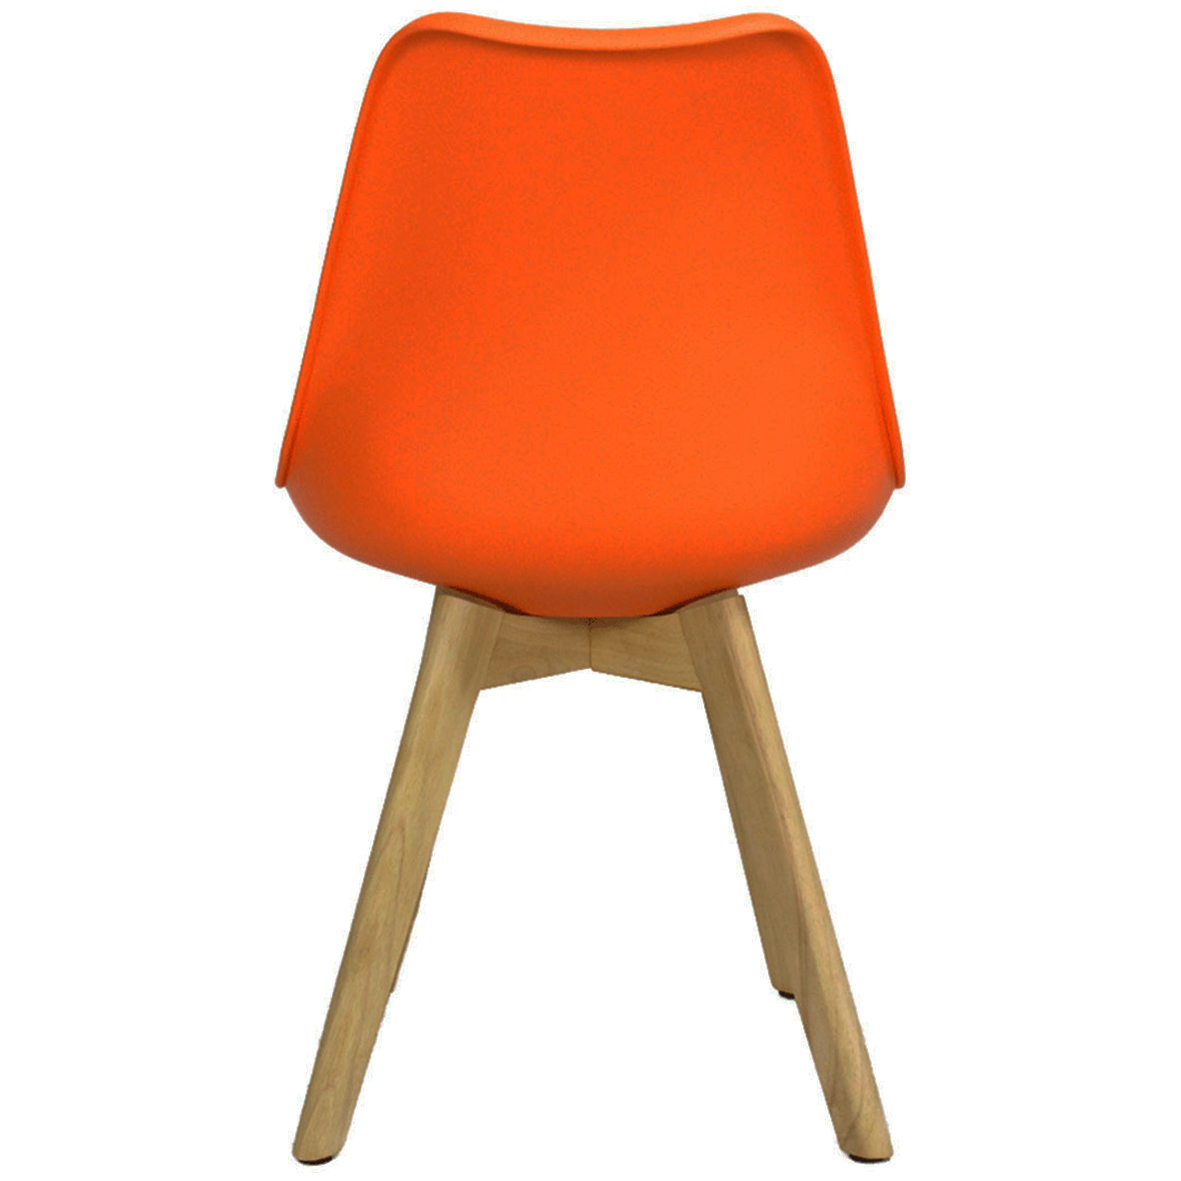 Kuipstoel duro oranje3